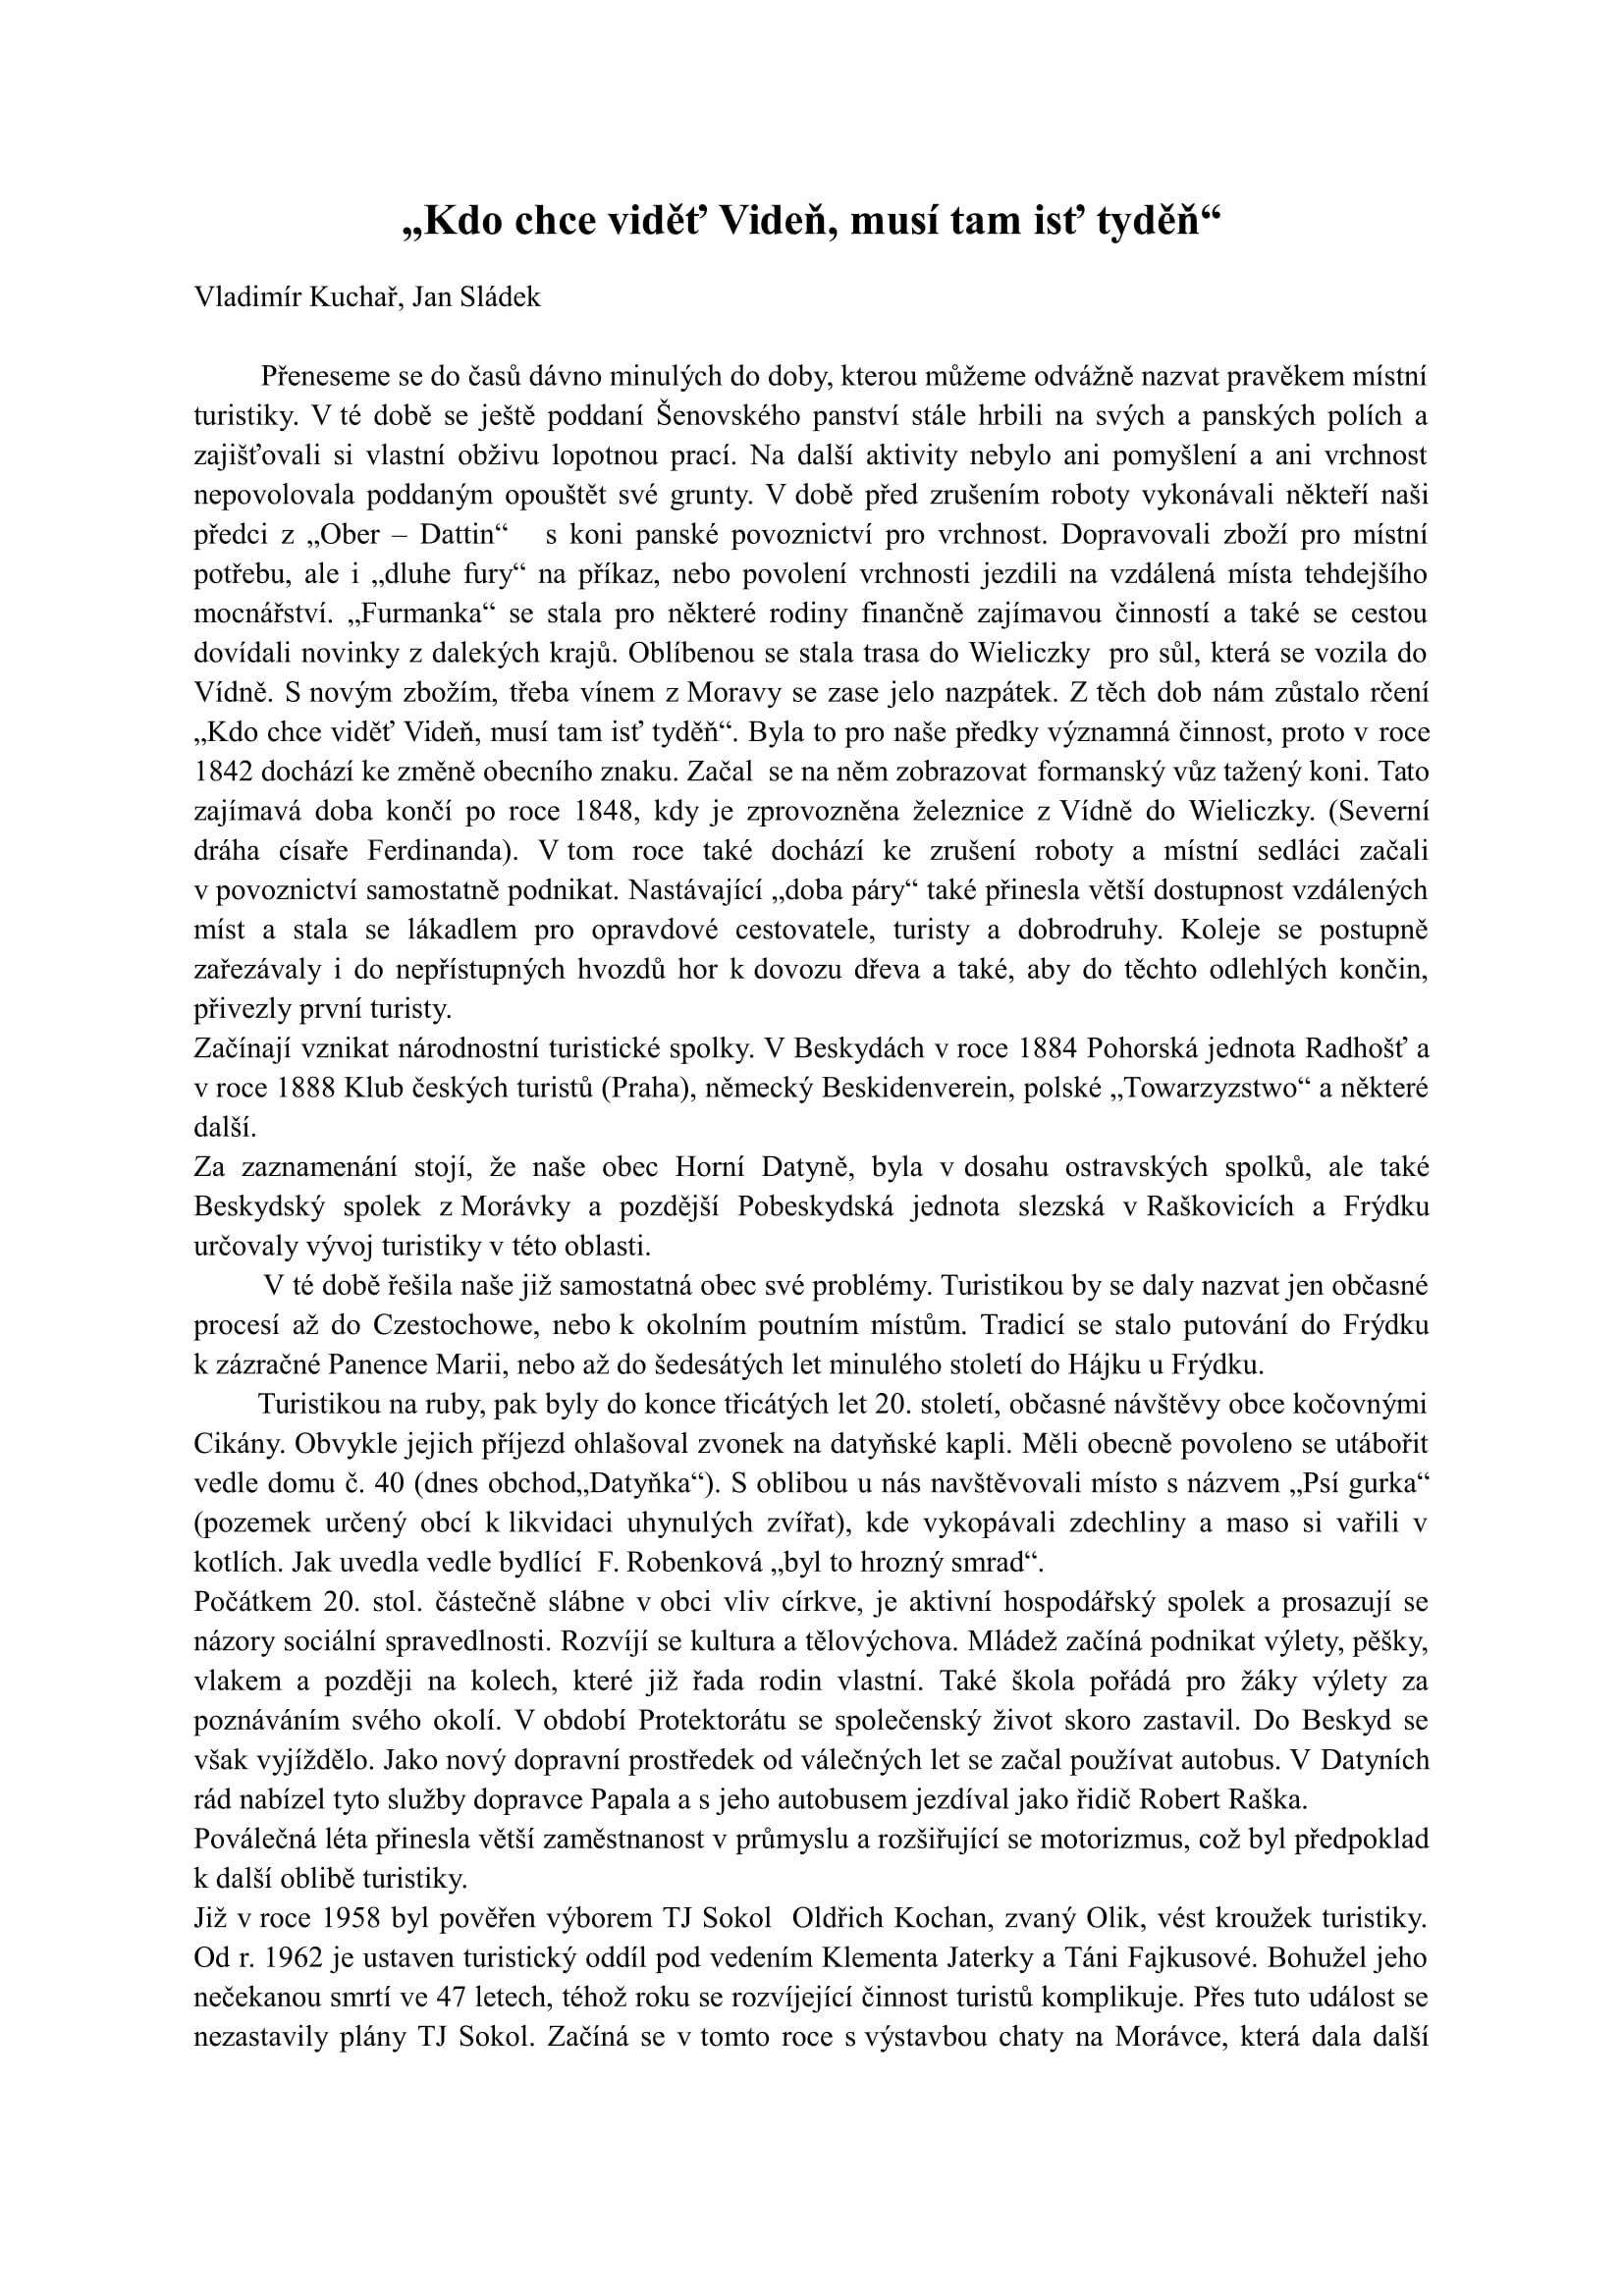 Sborník 50 let chata-04